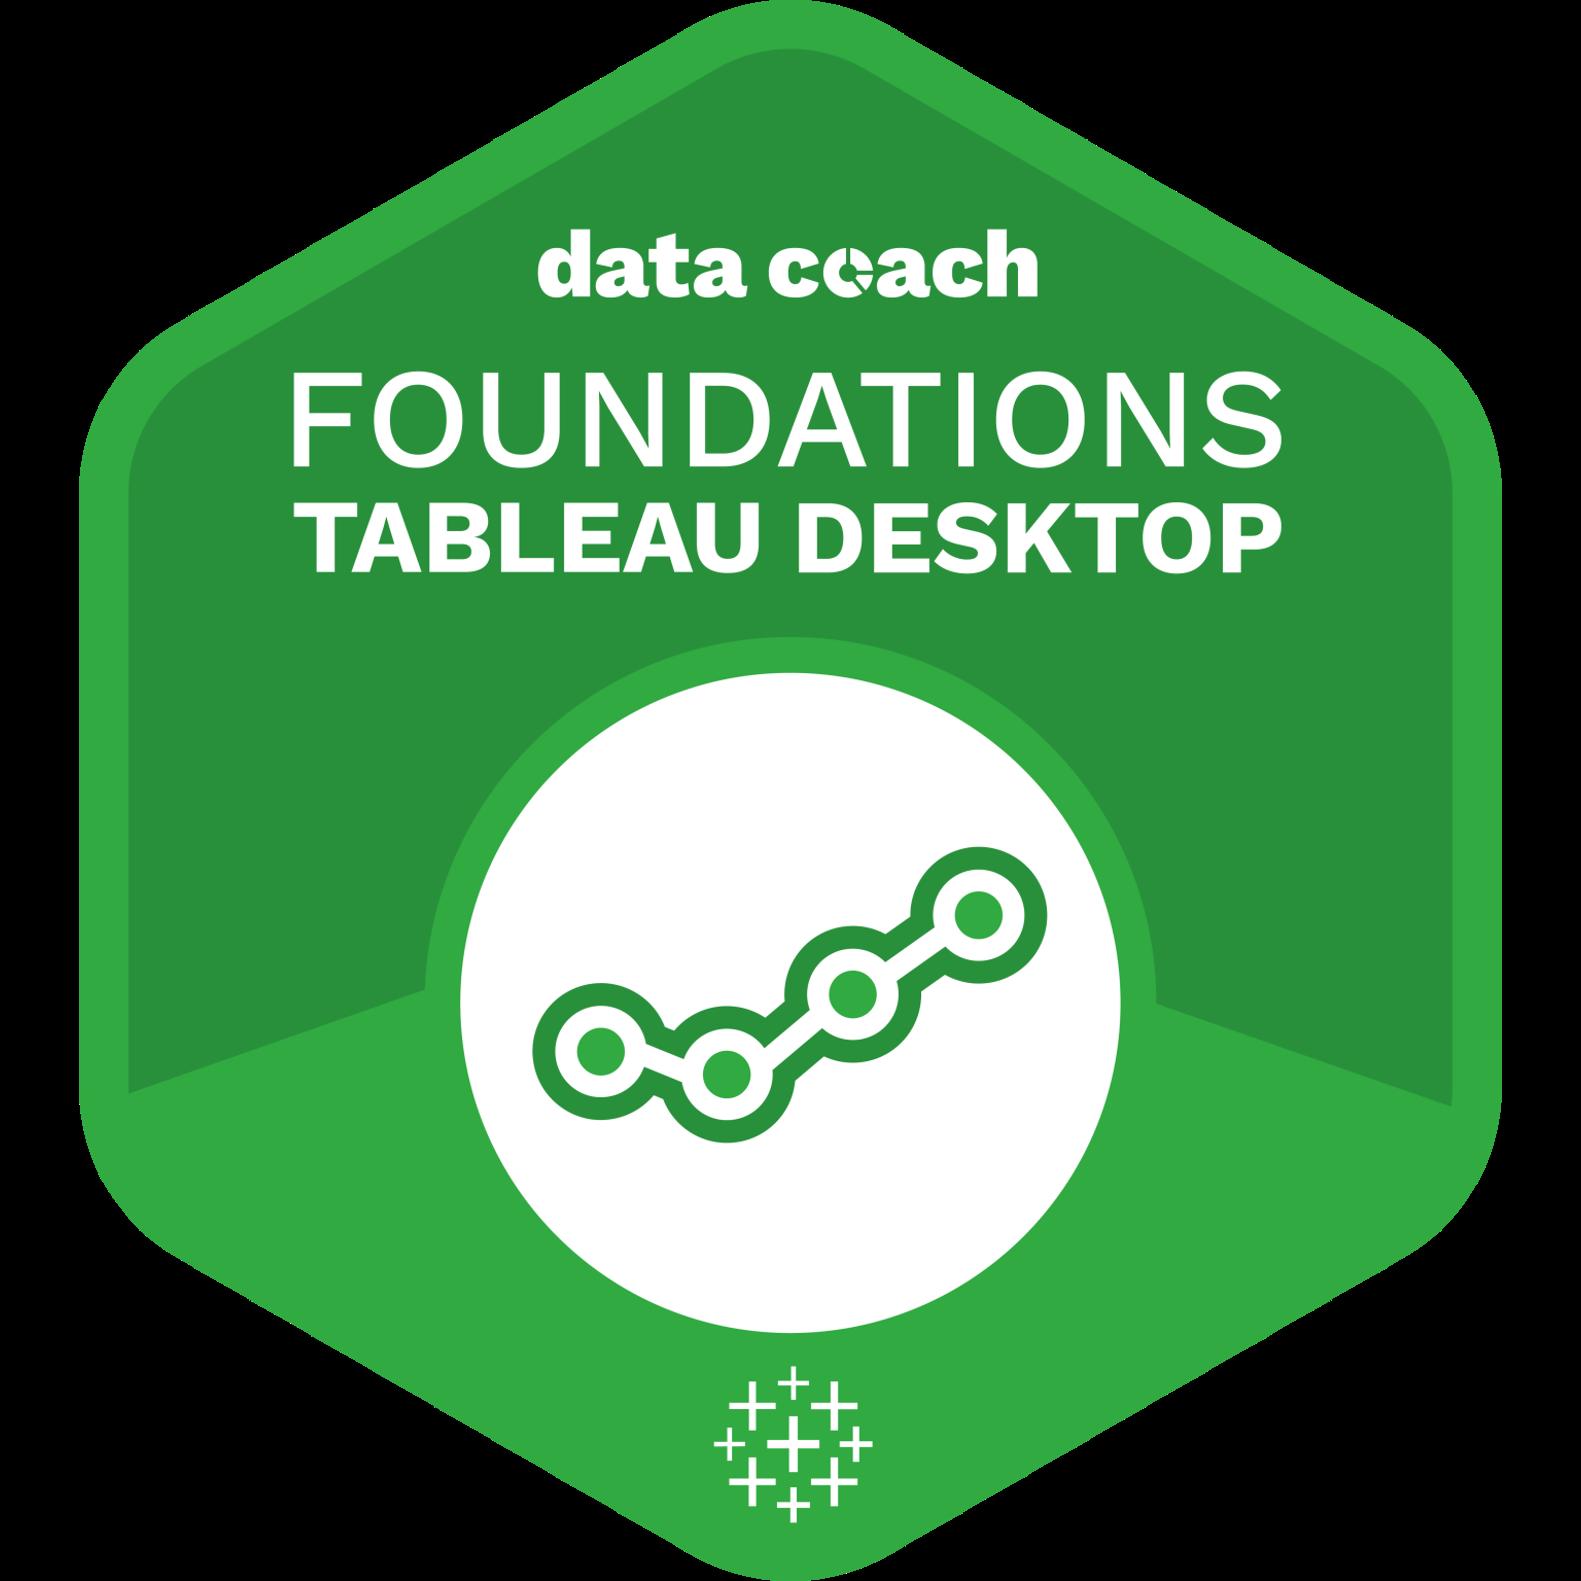 Tableau-Desktop-Foundations-1536x1536-1